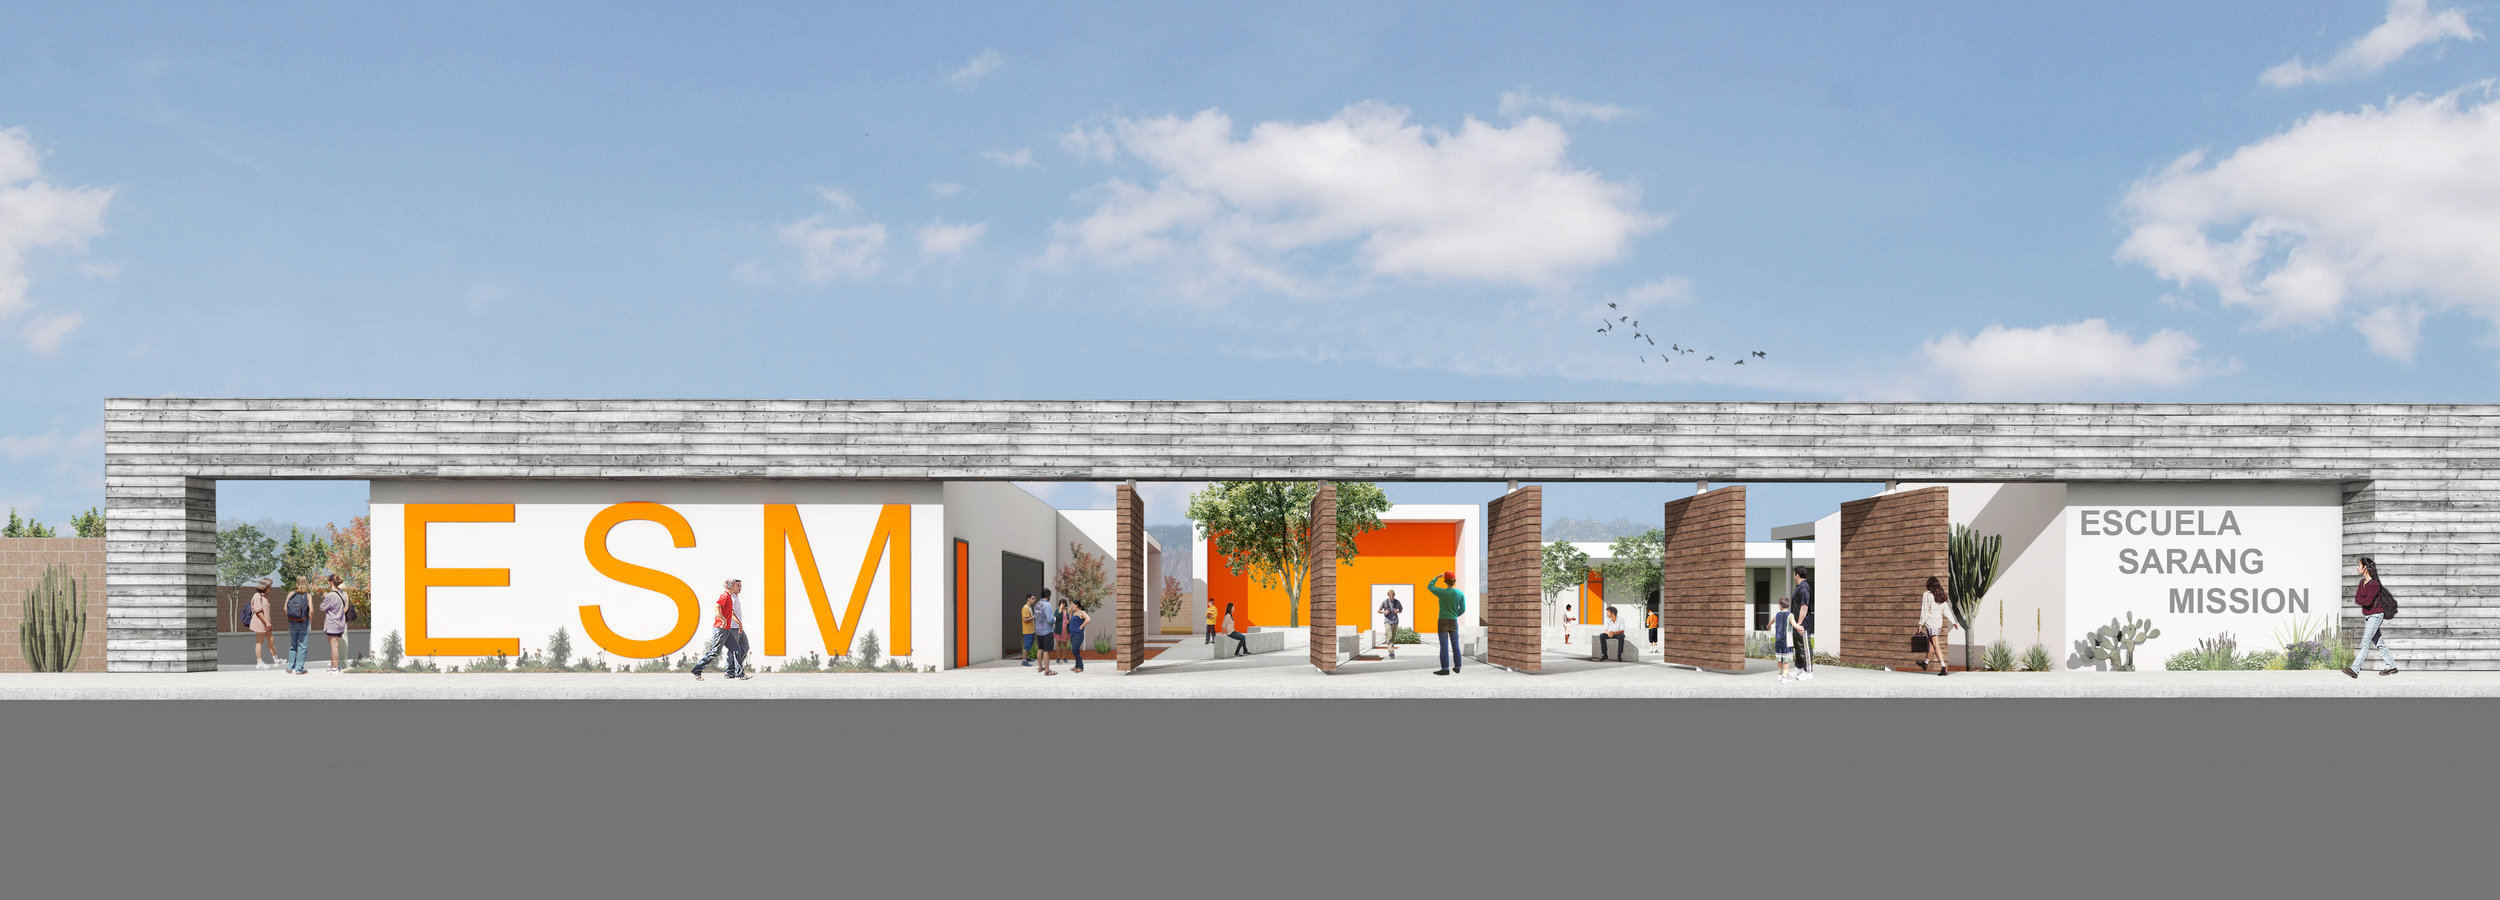 Escuela Sarang Mission.jpg